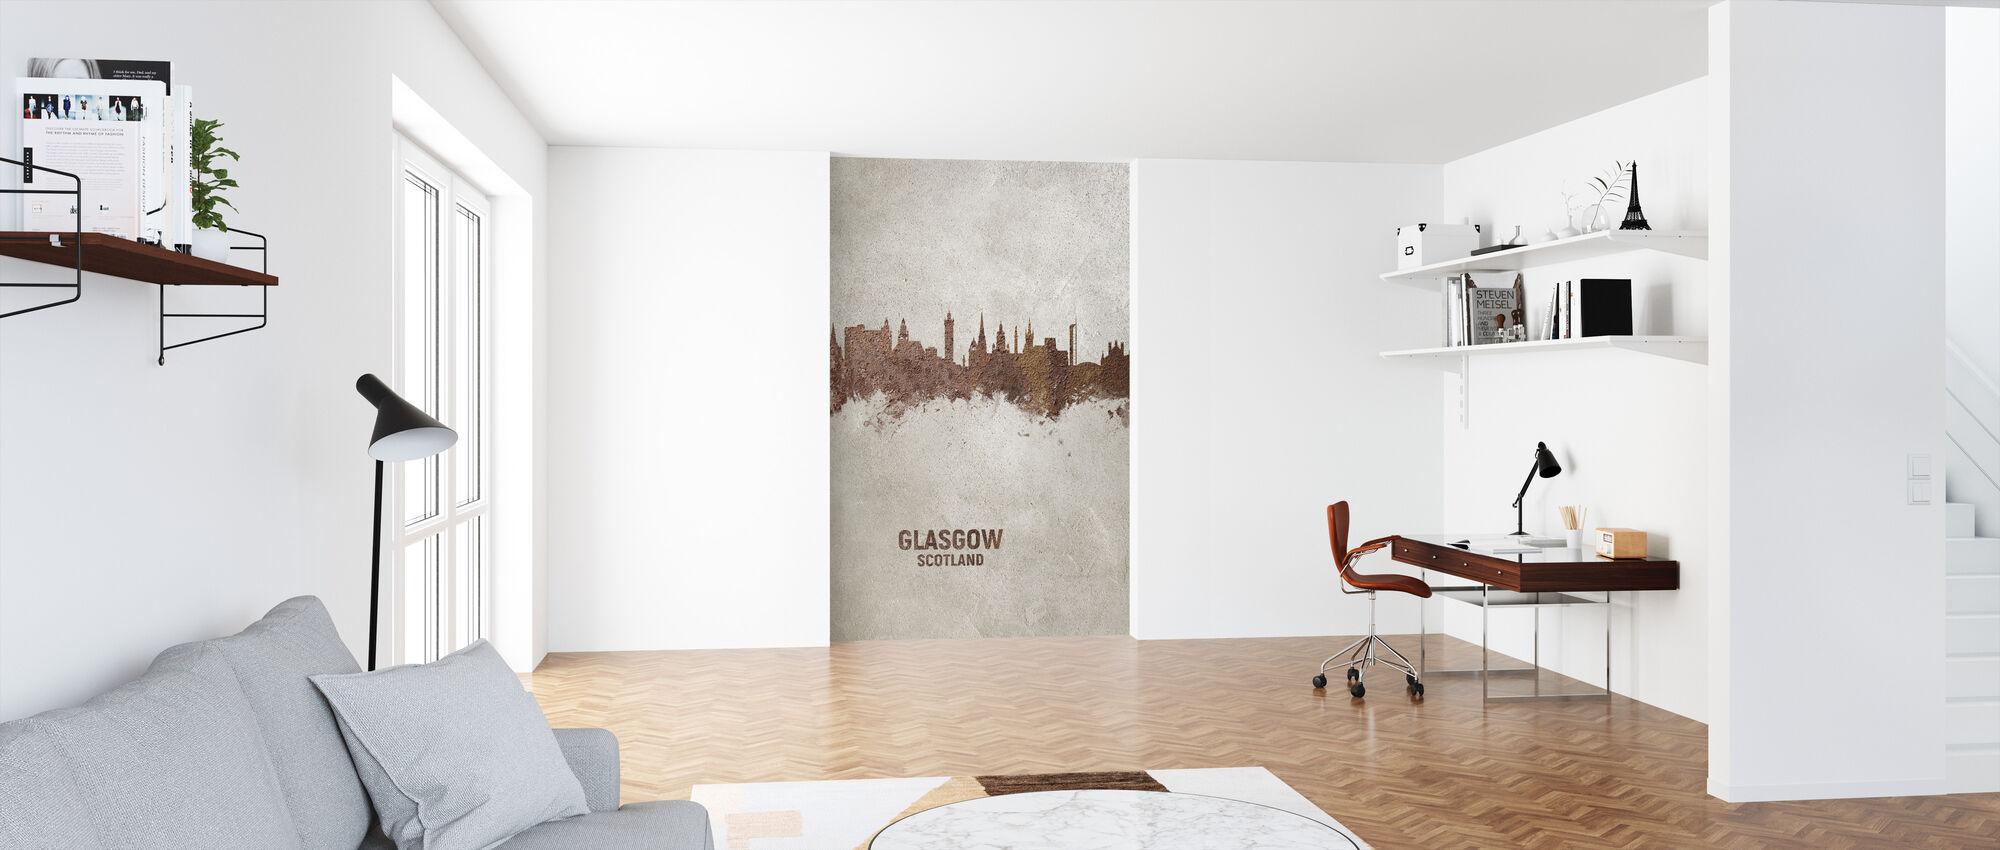 Glasgow Scotland Rust Skyline - Wallpaper - Office